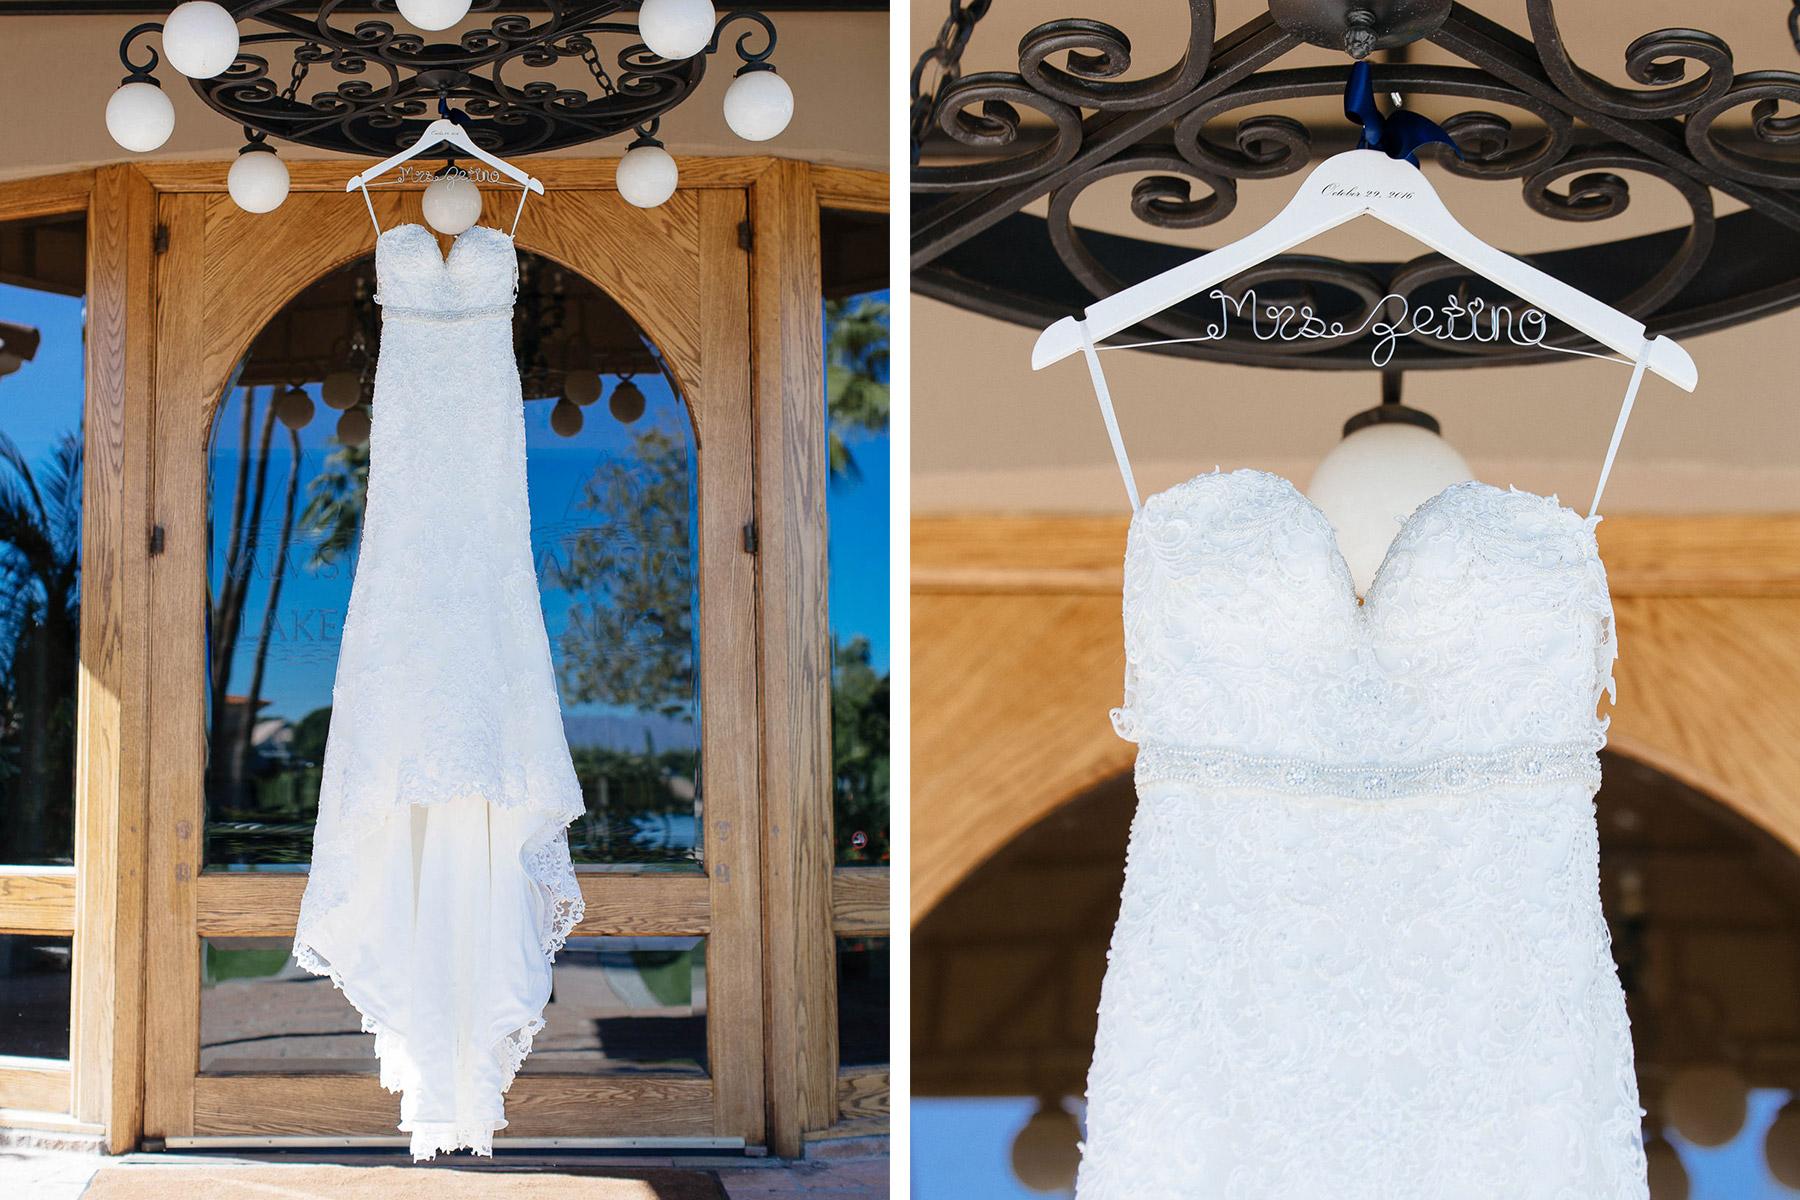 161029-Luxium-Weddings-Arizona-Jeff-Griselda-First-Look-Val-Vista-Lakes-Gilber-005a.jpg